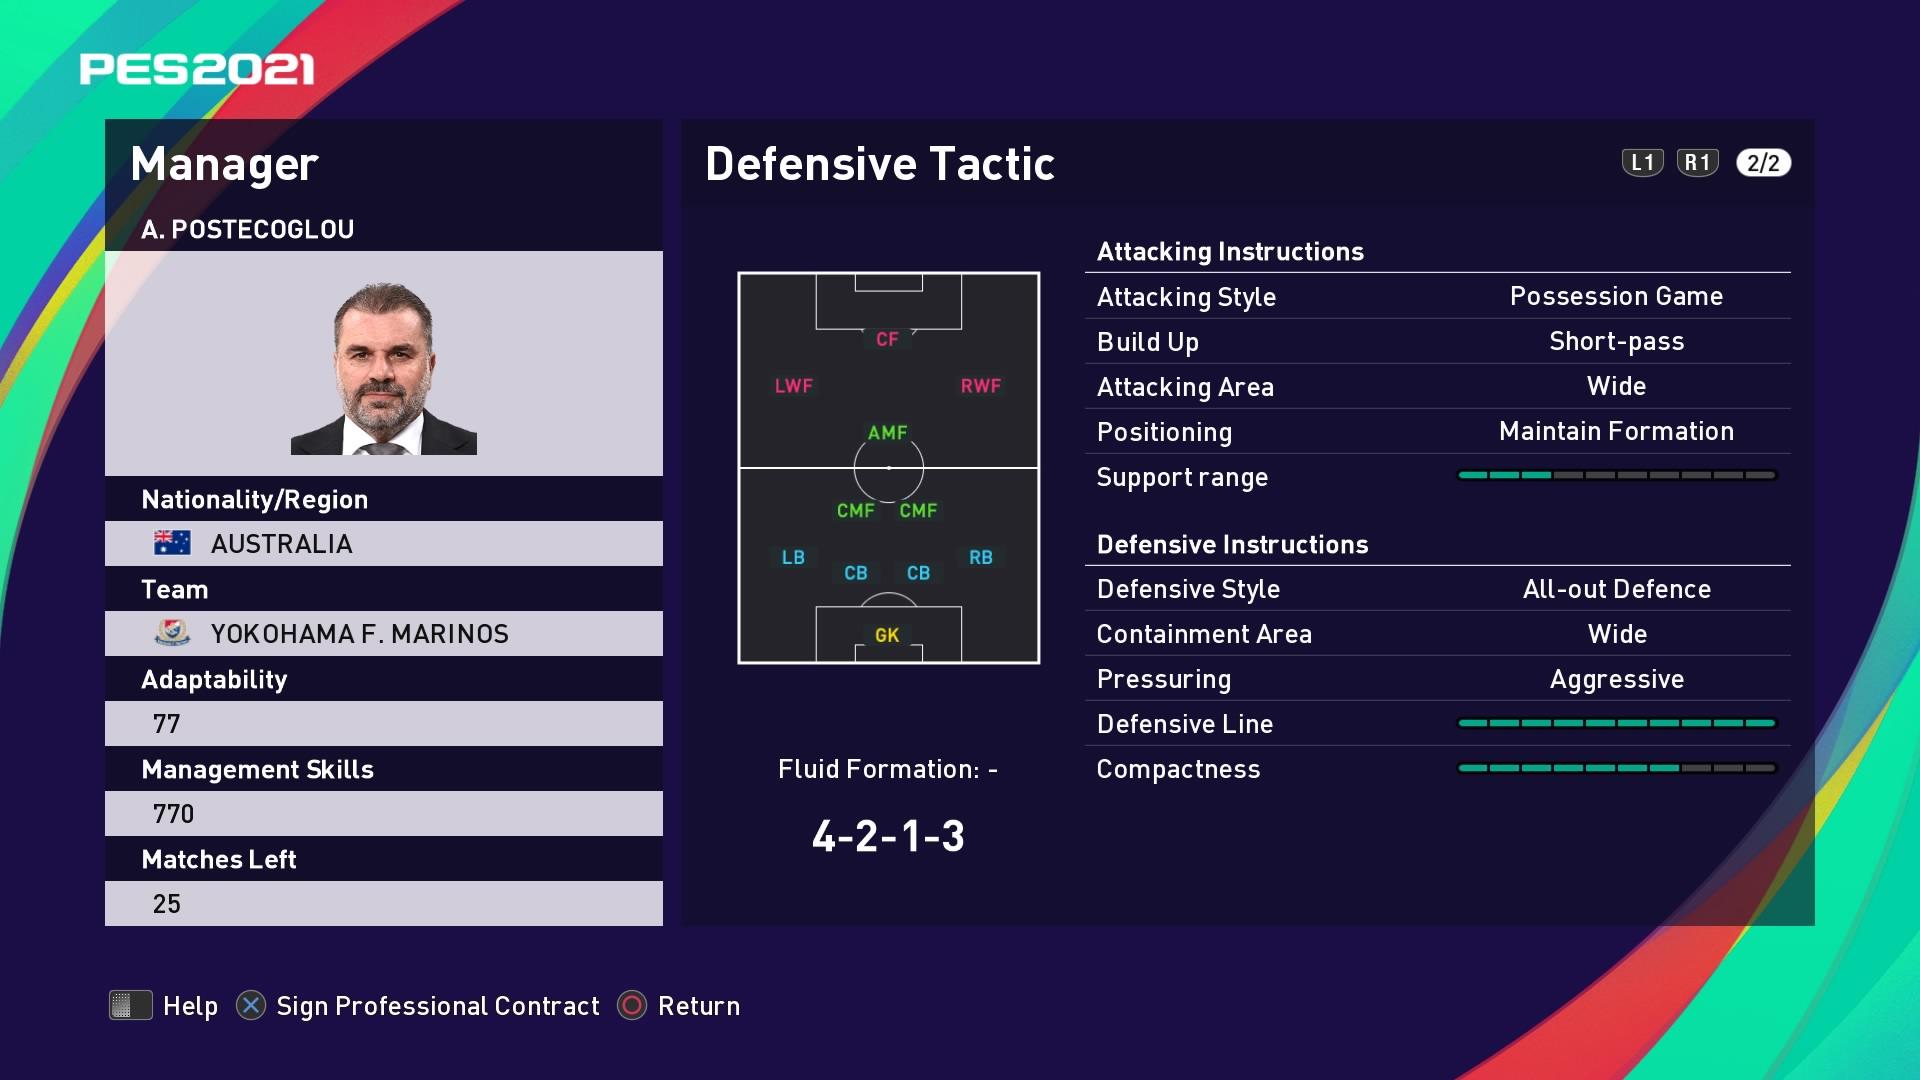 A. Postecoglou (Ange Postecoglou) Defensive Tactic in PES 2021 myClub